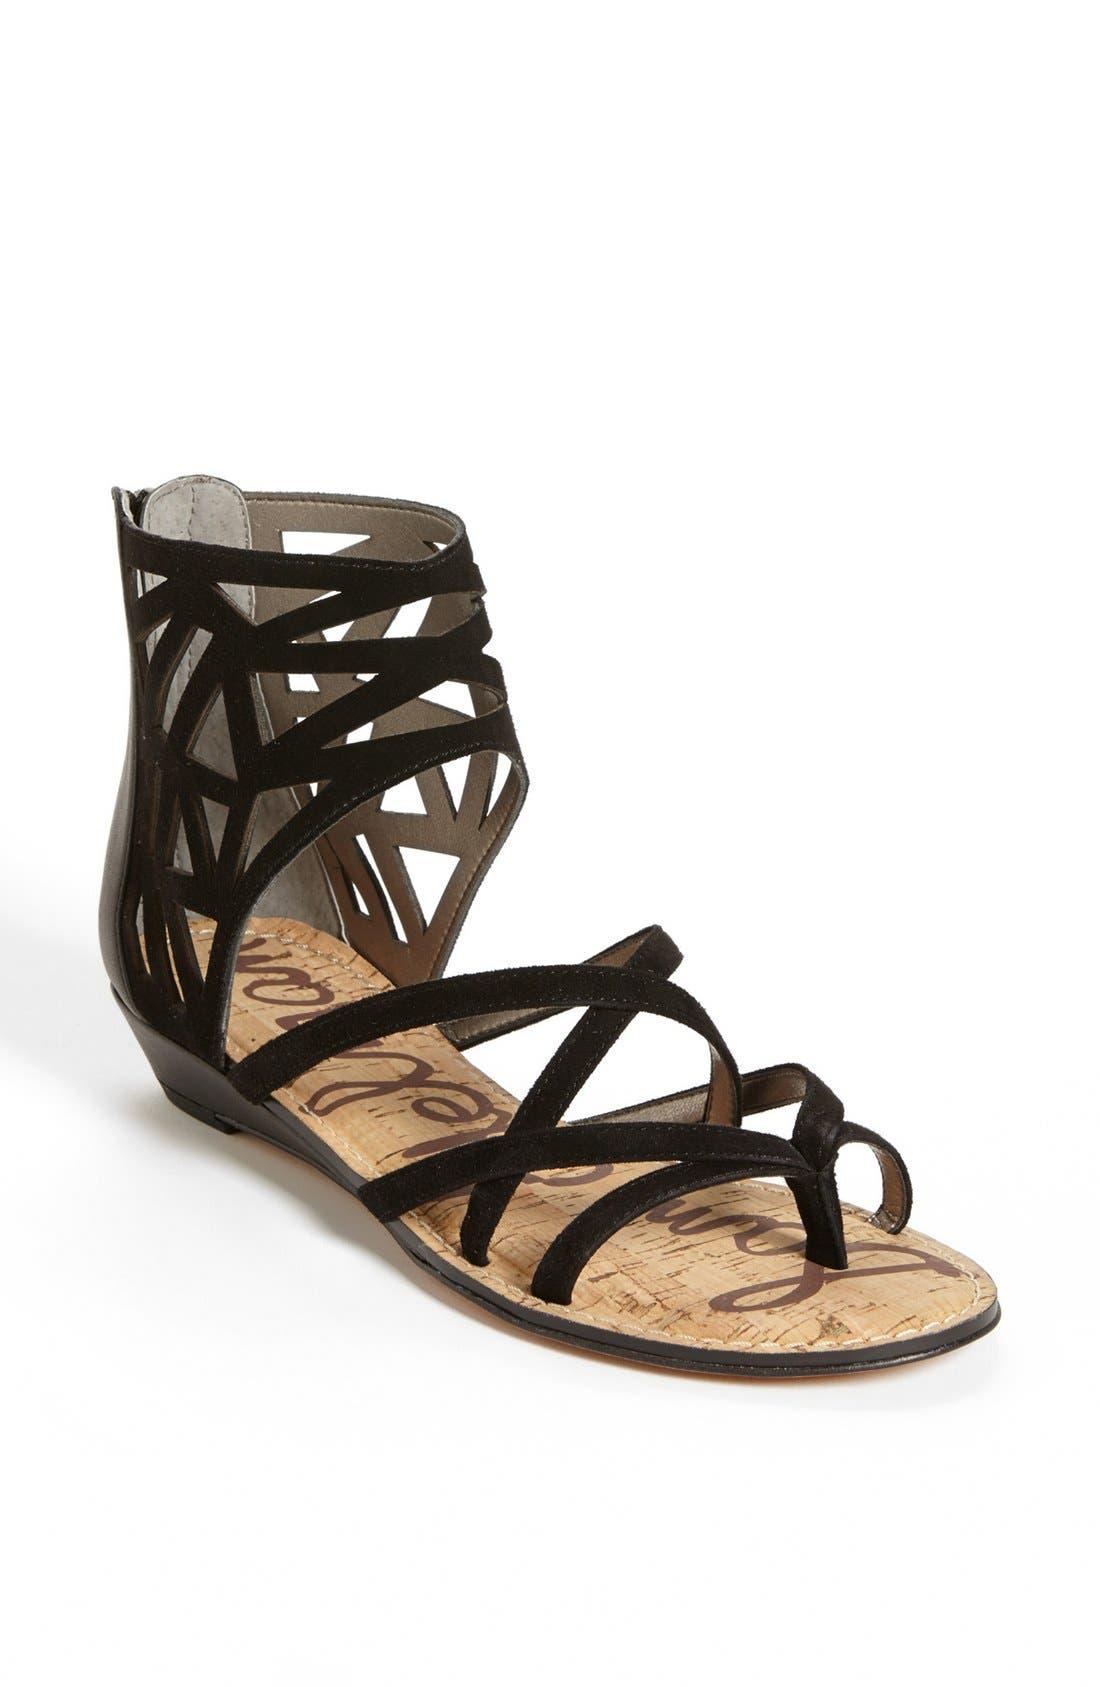 Main Image - Sam Edelman 'Dana' Leather Sandal